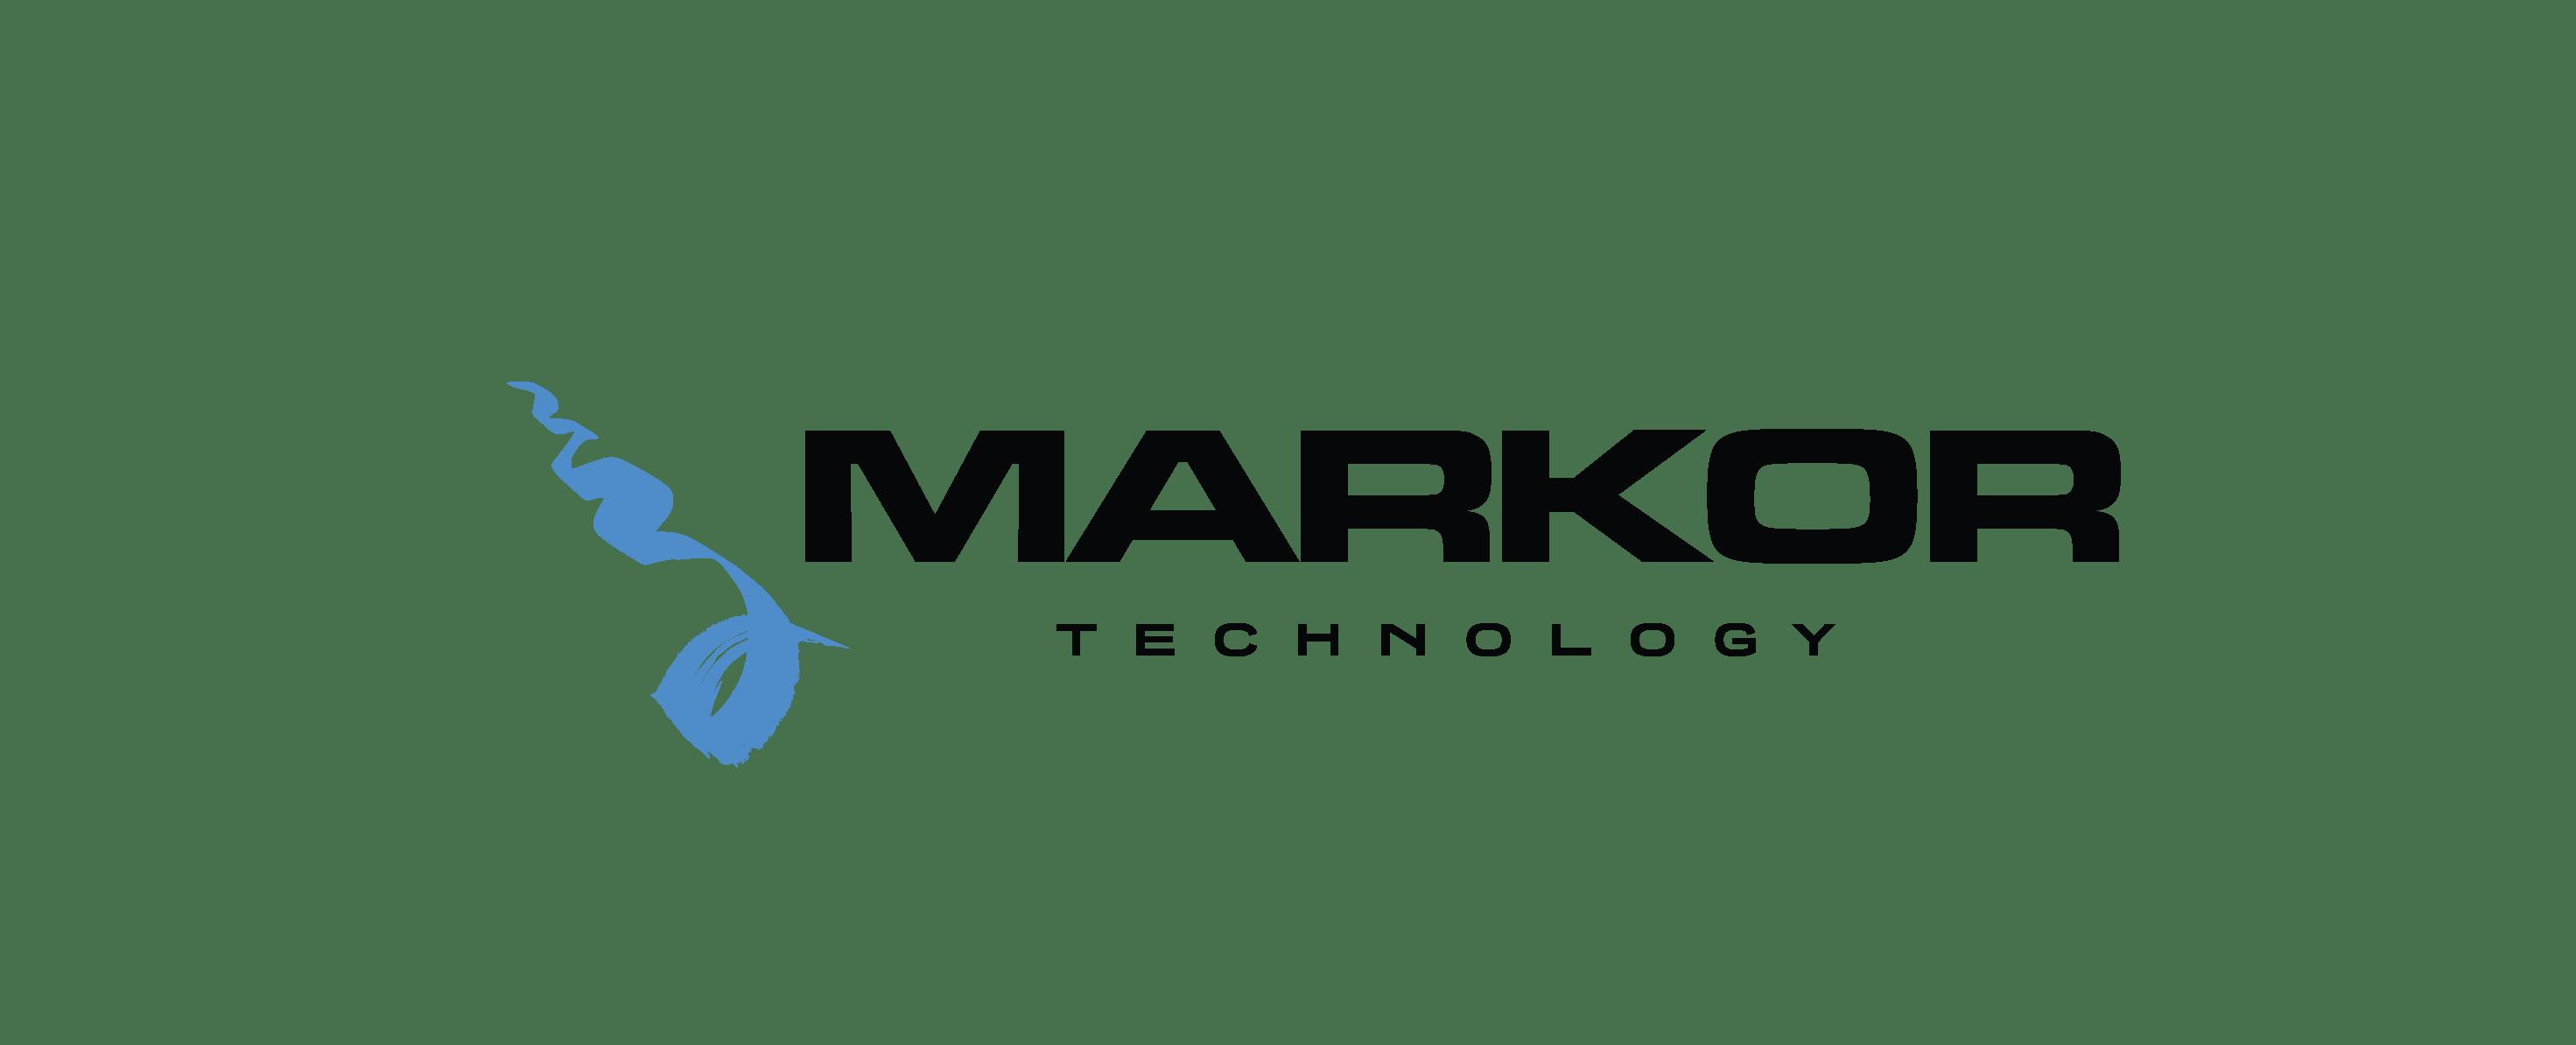 Markor Technology giochi